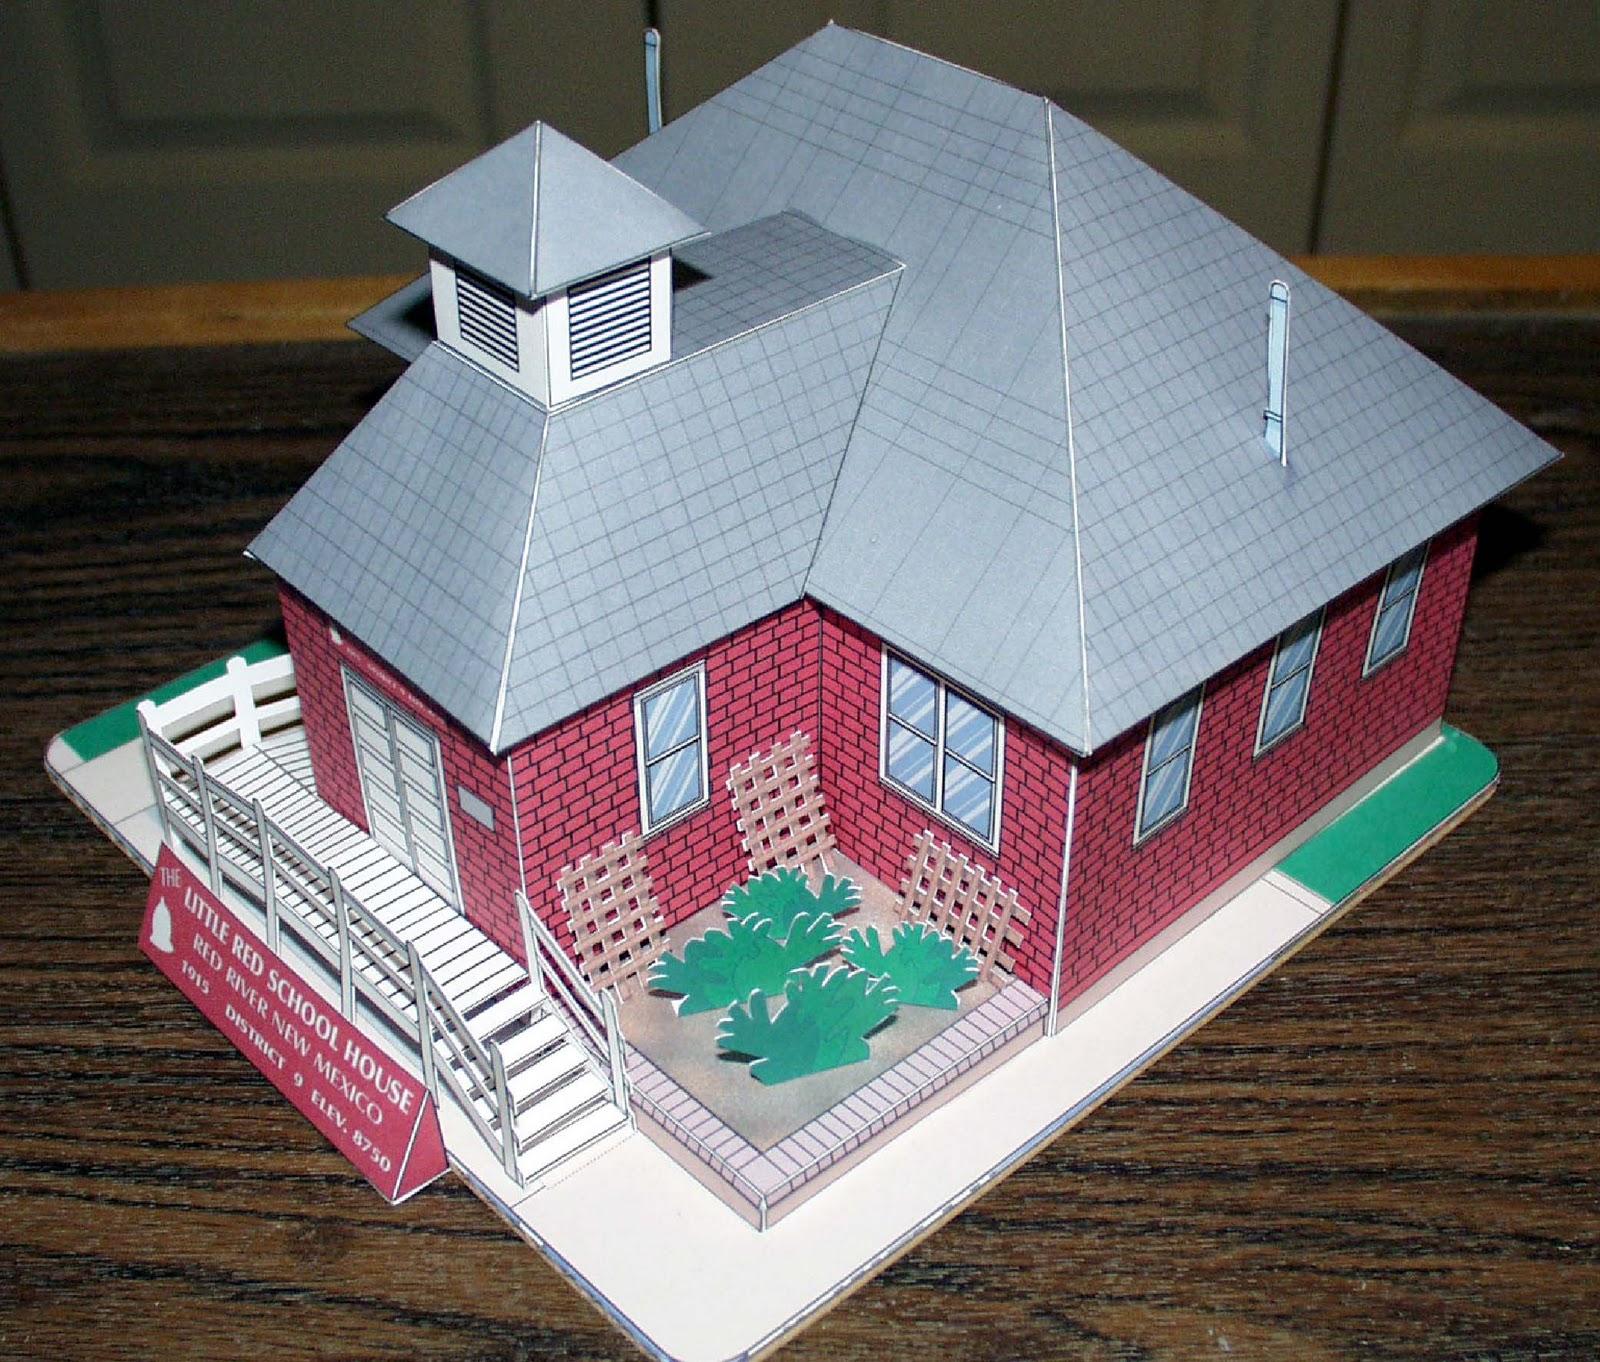 my little house red schoolhouse paper model. Black Bedroom Furniture Sets. Home Design Ideas